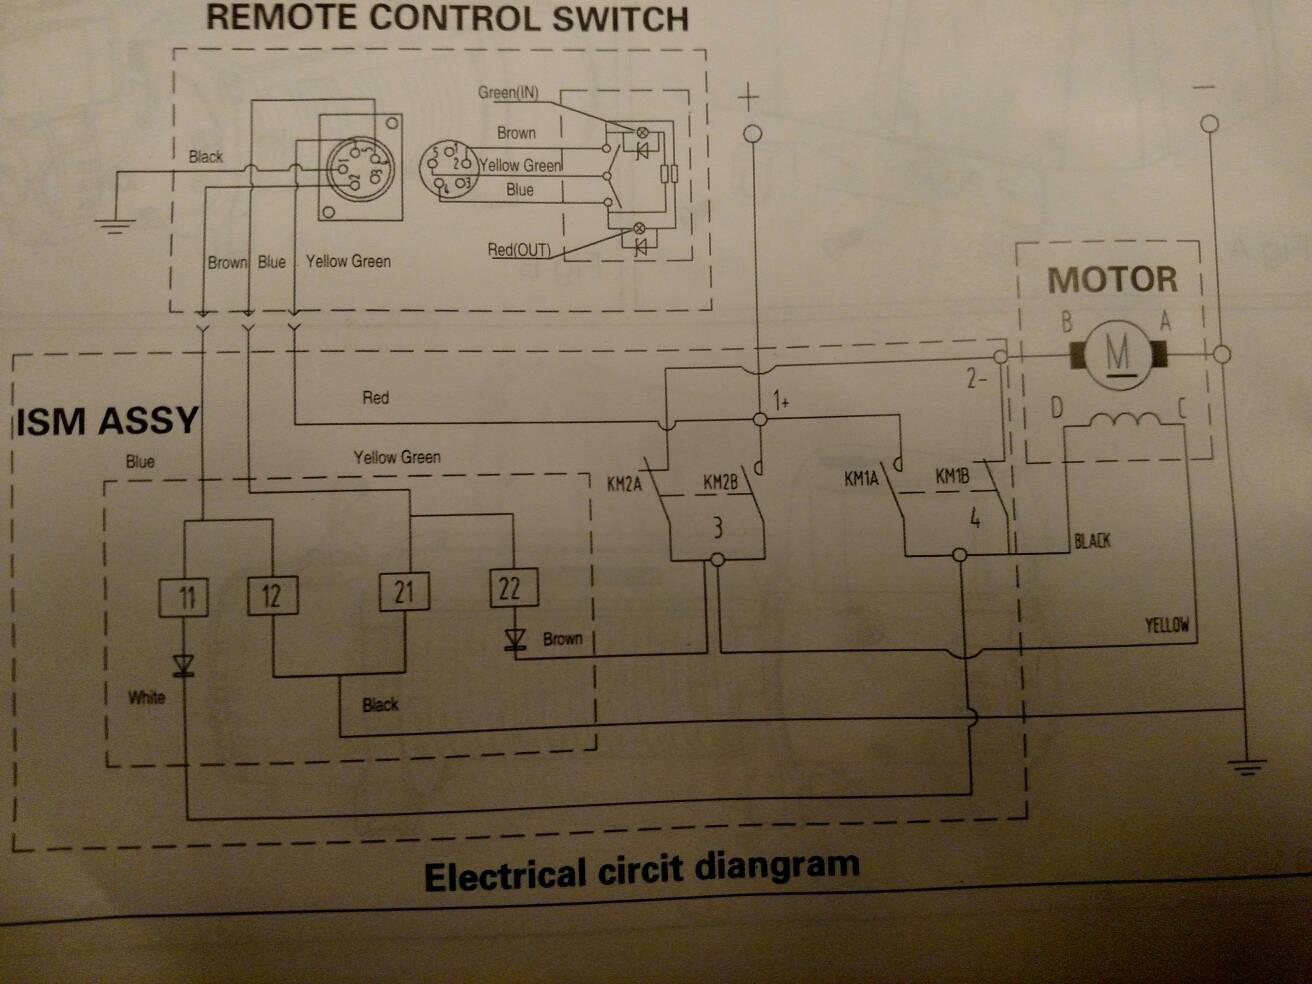 Smittybilt Xrc Winch Wiring Diagram | Wiring Liry on